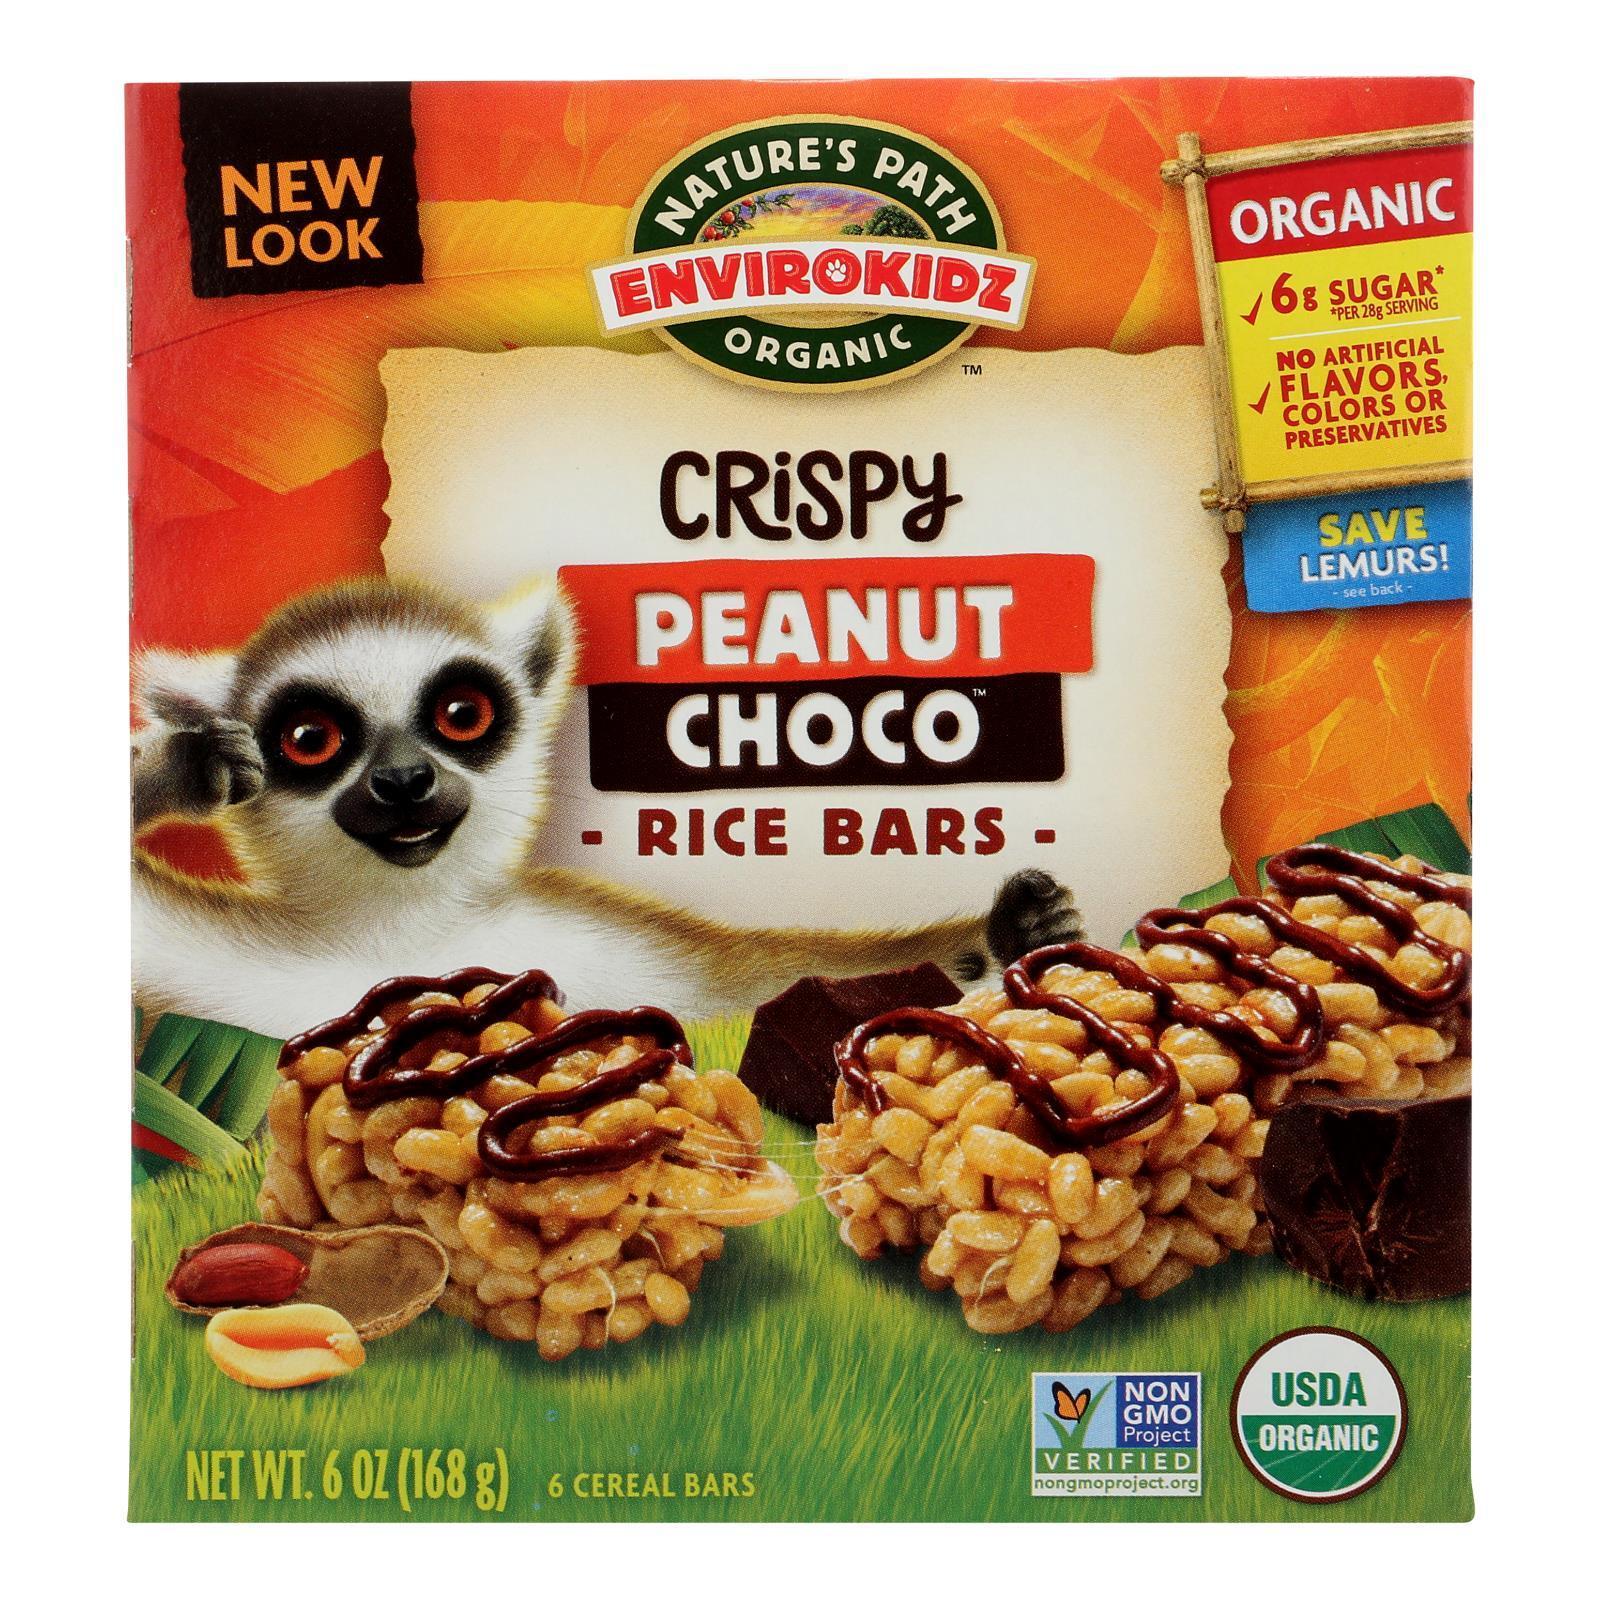 Envirokidz Crispy Rice Bars - Peanut Choco - Case of 6 - 6 oz.